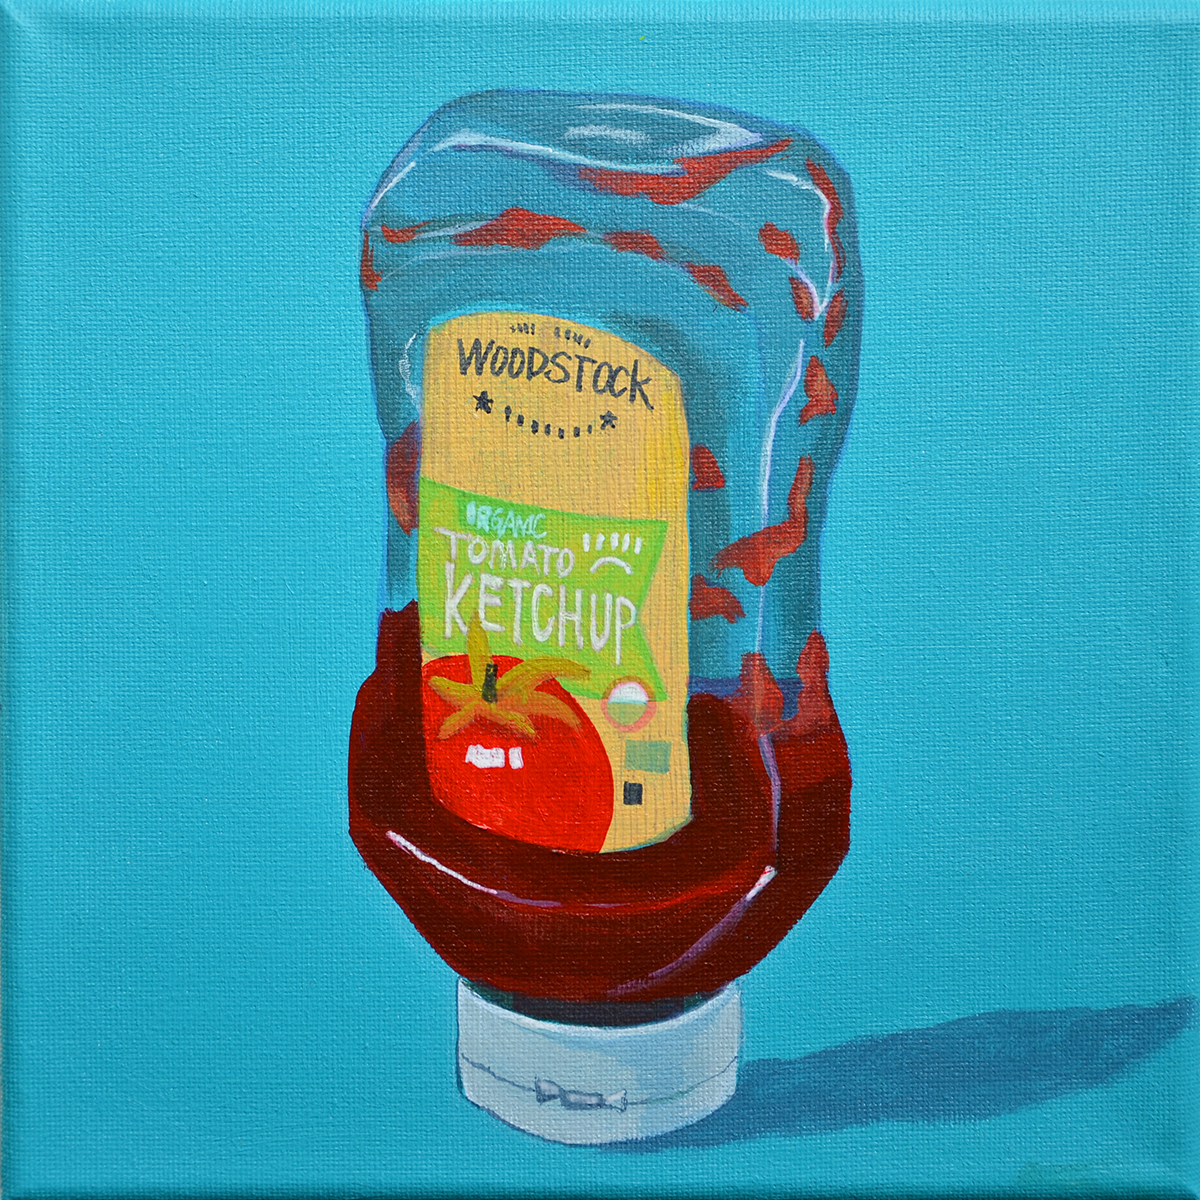 Ketchup Bottle-Tianqi Lu.JPG